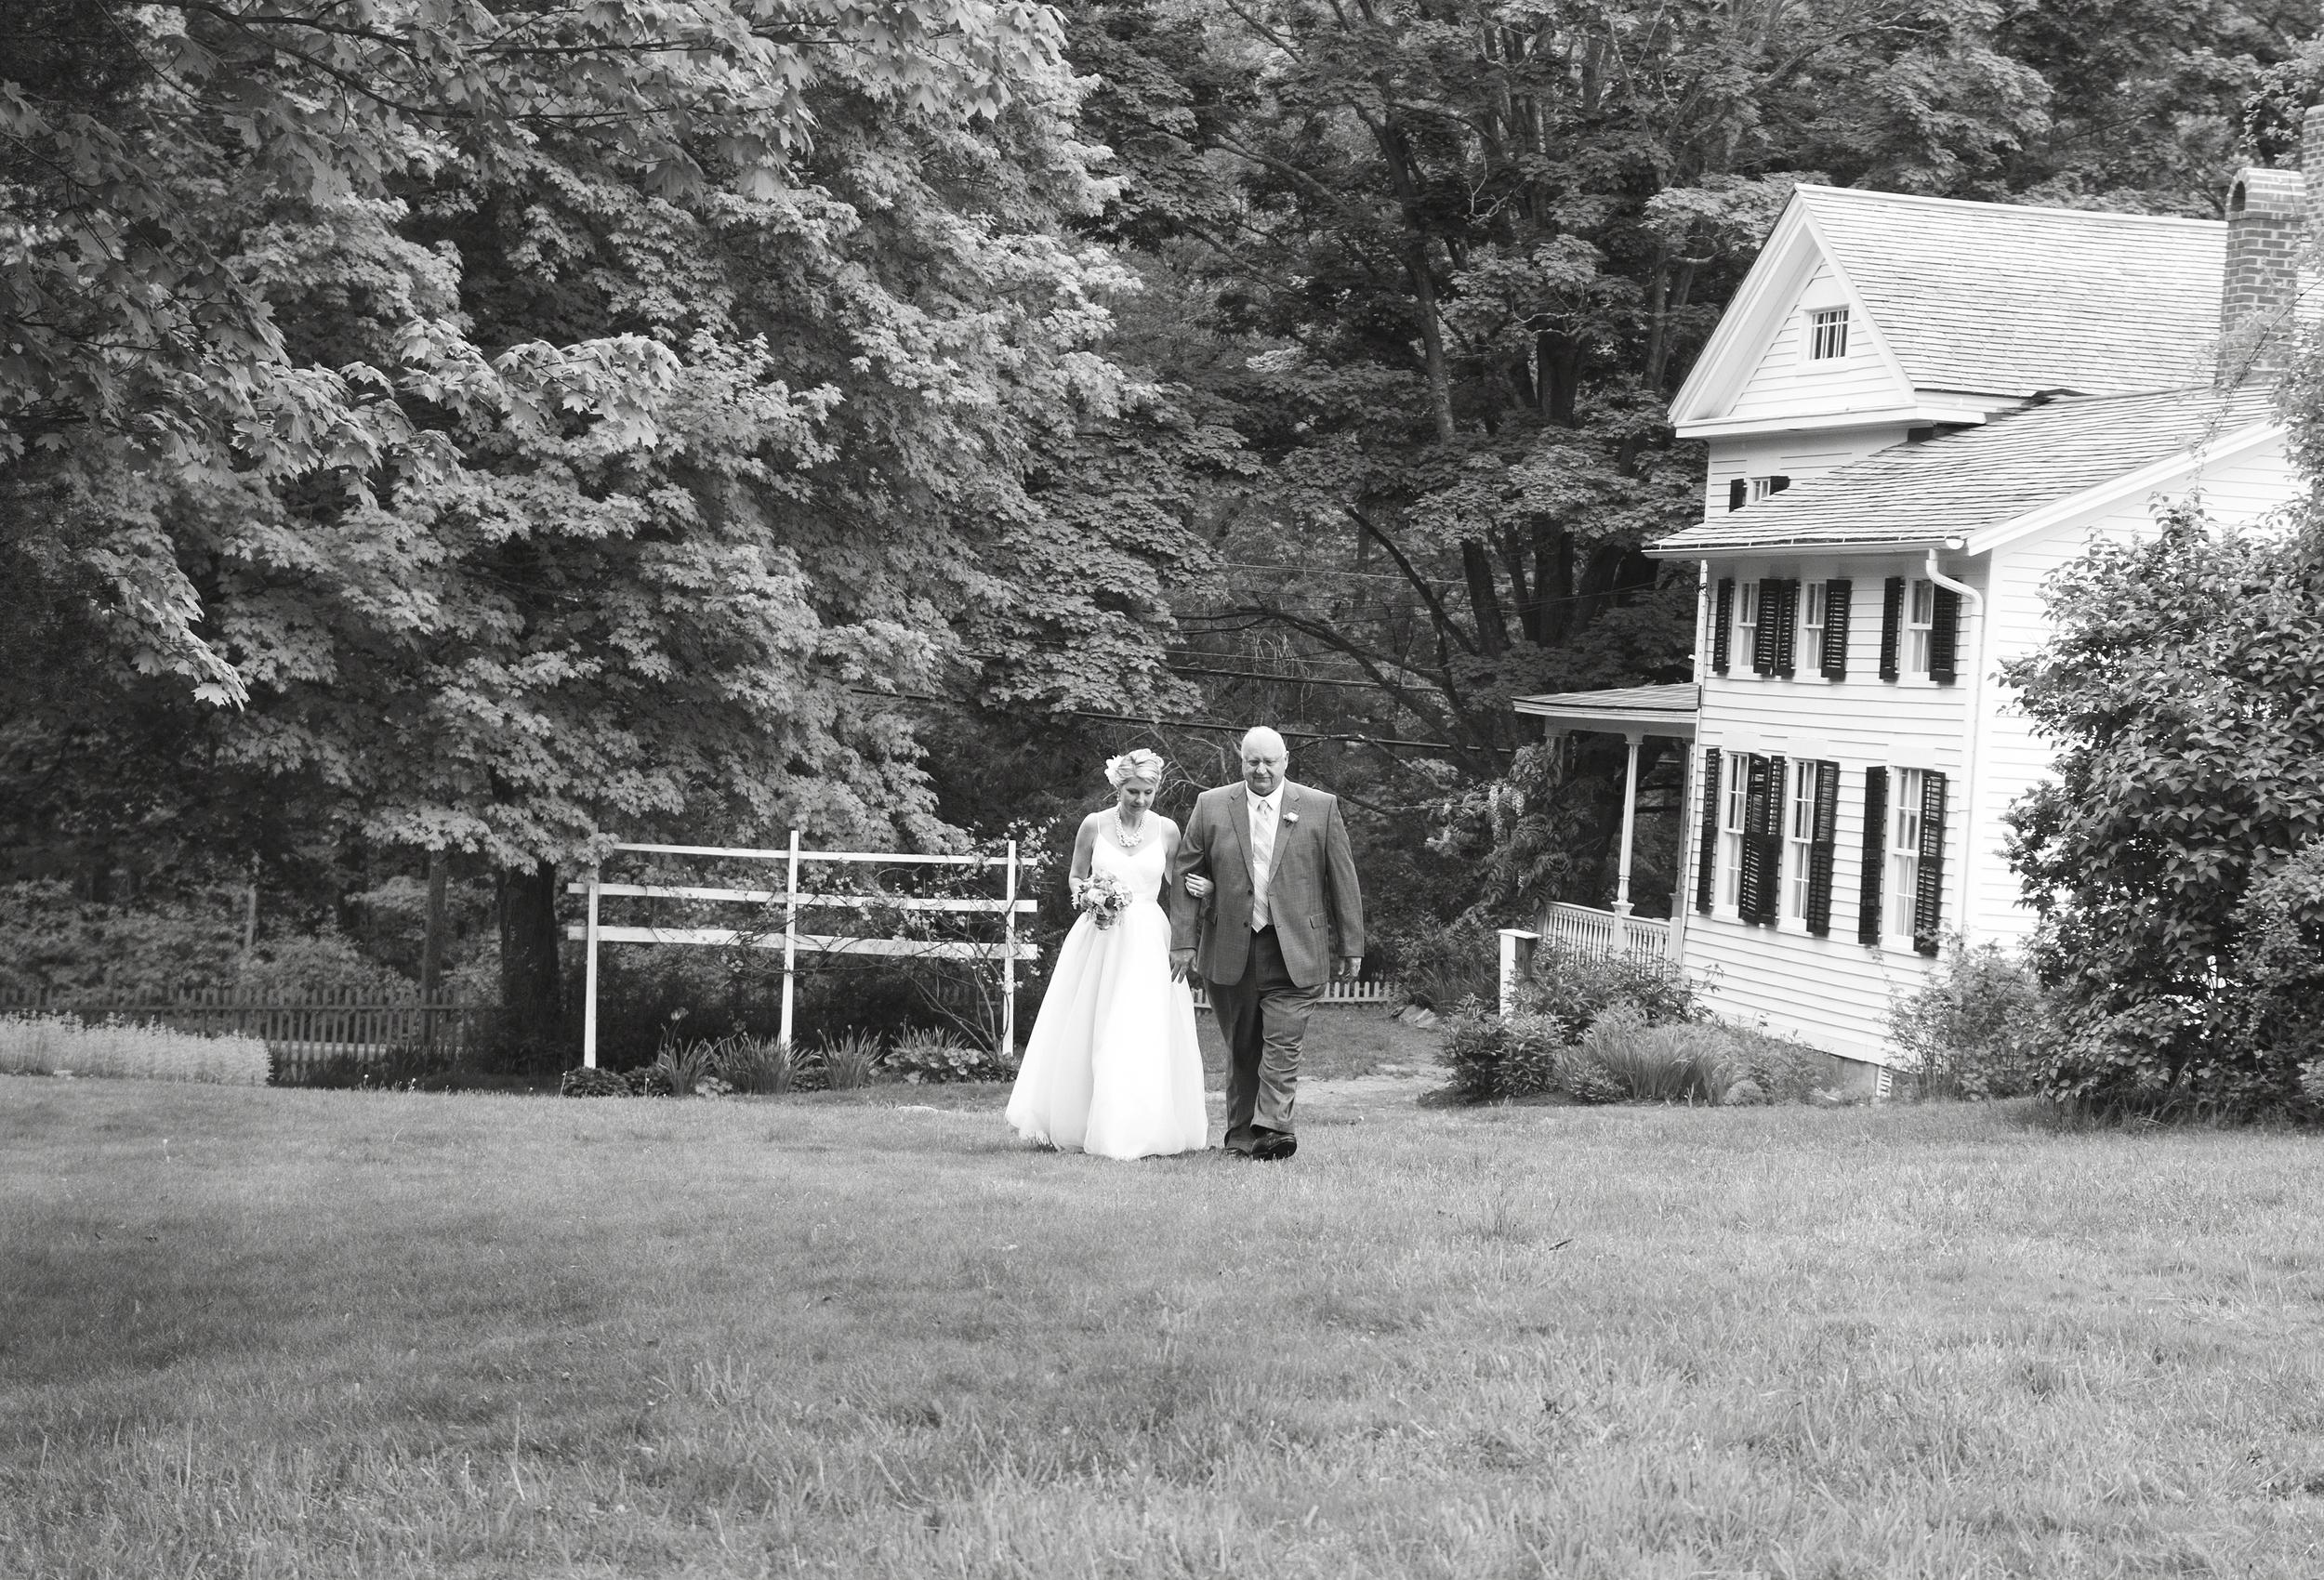 Angela_Chicoski_CT_wedding_photographer_057.jpg